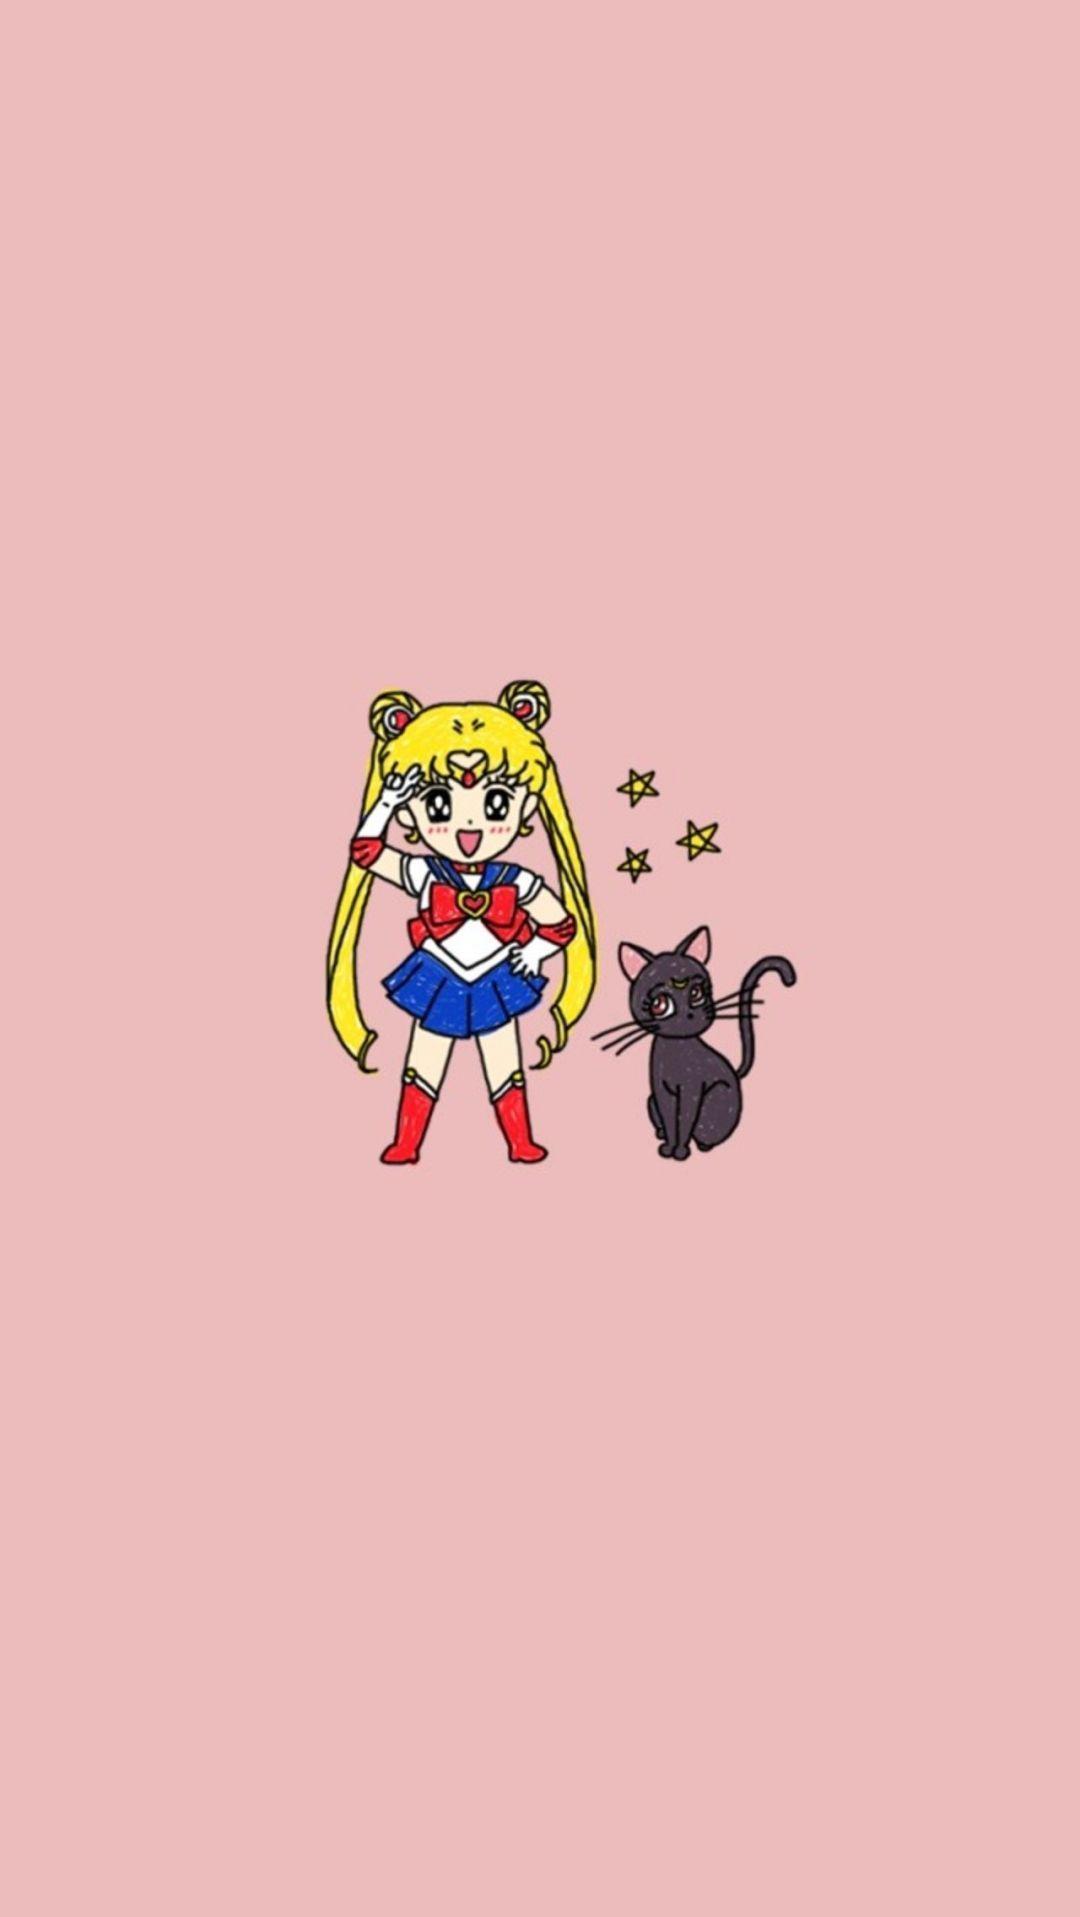 1080p 1280x2272 Aesthetic Android Backgrounds Characters Desktop Iphone Phonebackgroundstumblr In 2020 Sailor Moon Wallpaper Sailor Moon Sailor Moon Aesthetic